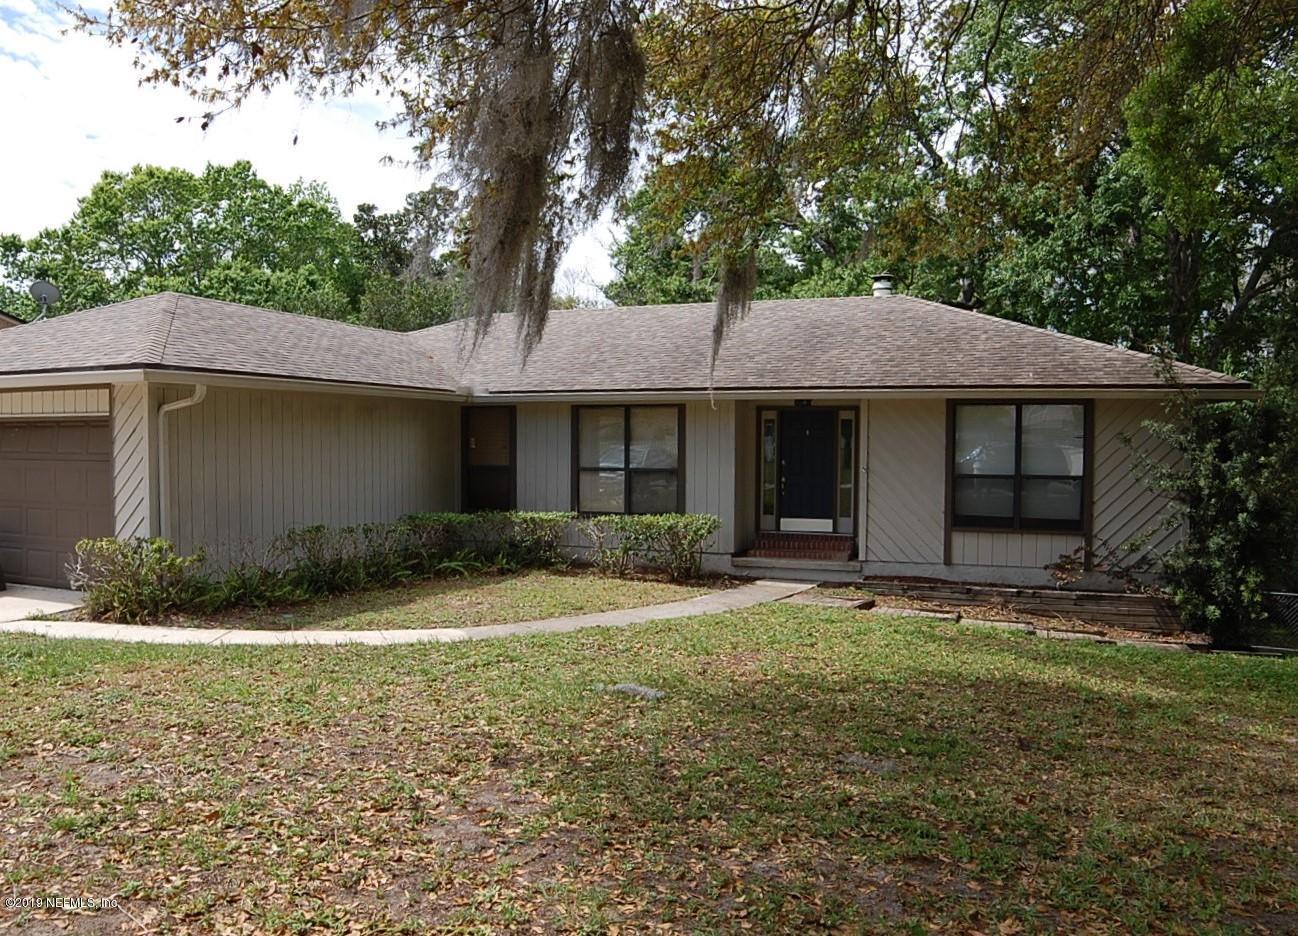 1580 OAK RIDGE, JACKSONVILLE, FLORIDA 32225, 3 Bedrooms Bedrooms, ,2 BathroomsBathrooms,Residential - single family,For sale,OAK RIDGE,985192